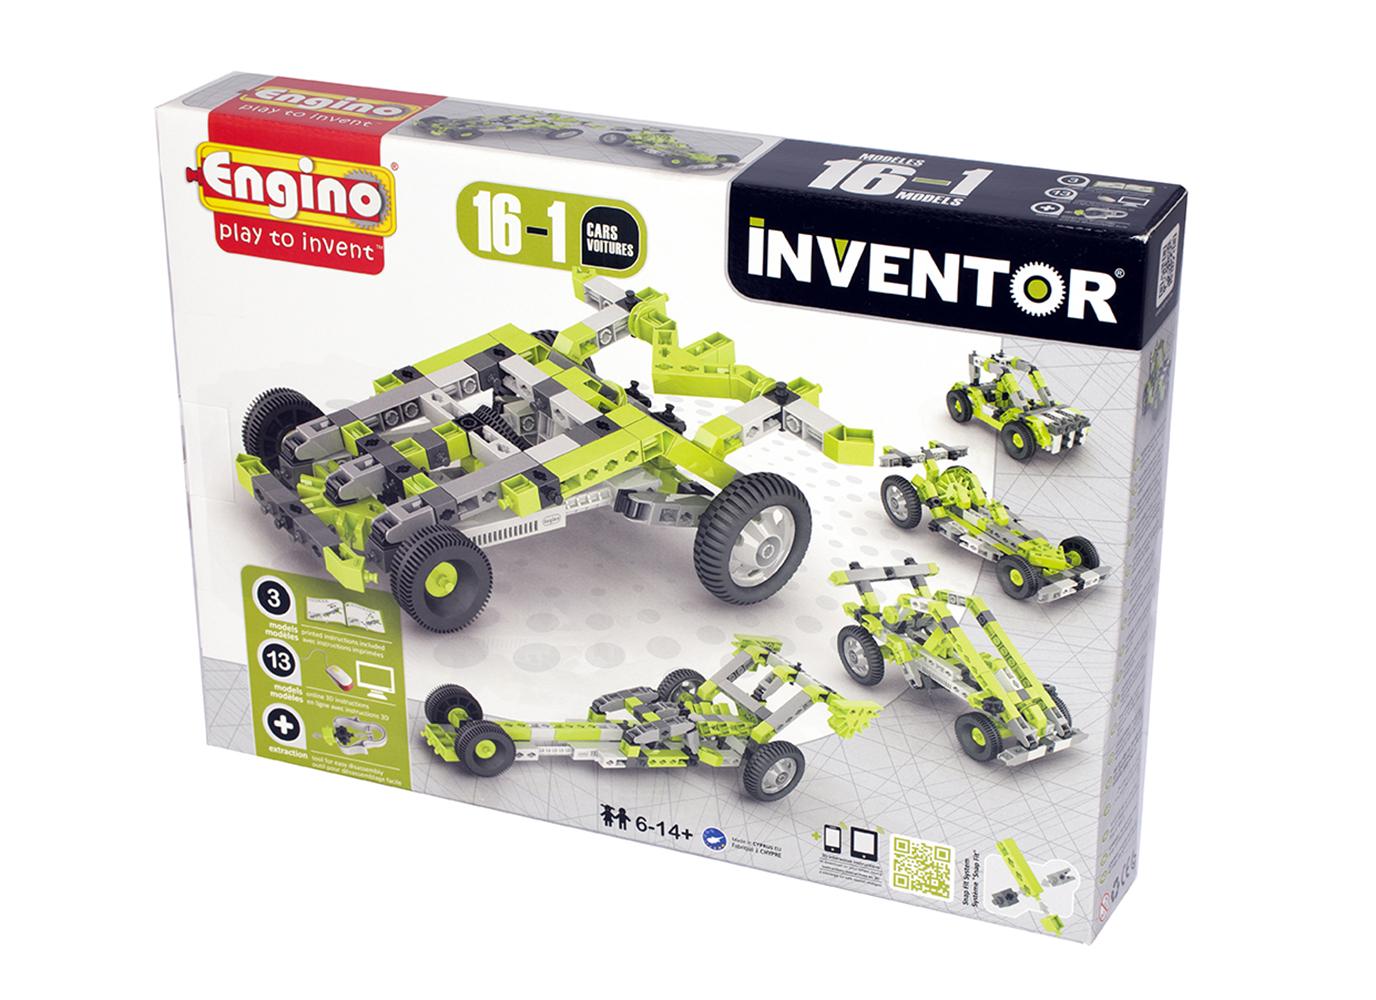 Inventor 16 Modèles Voitures